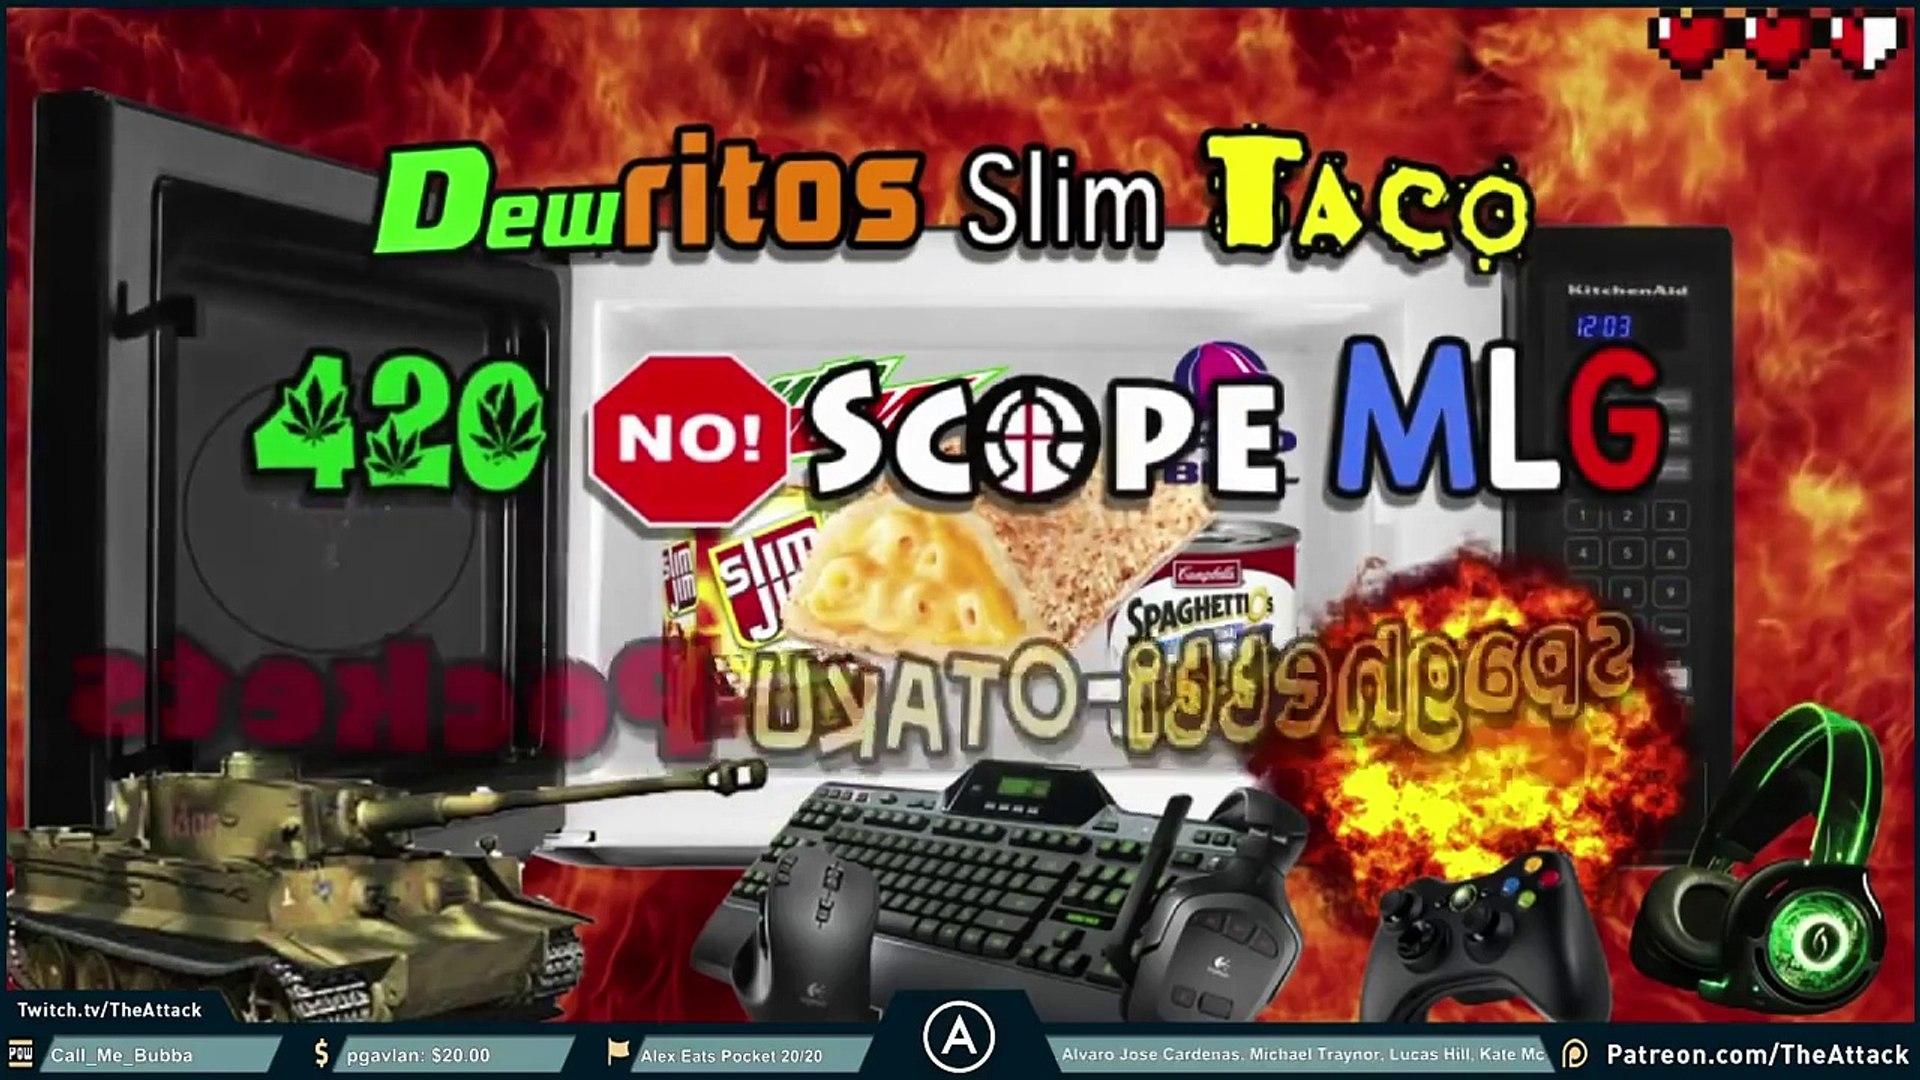 Dewritos Slim Taco 420 No Scope MLG Spaghetti Otaku Pockets Challenge!